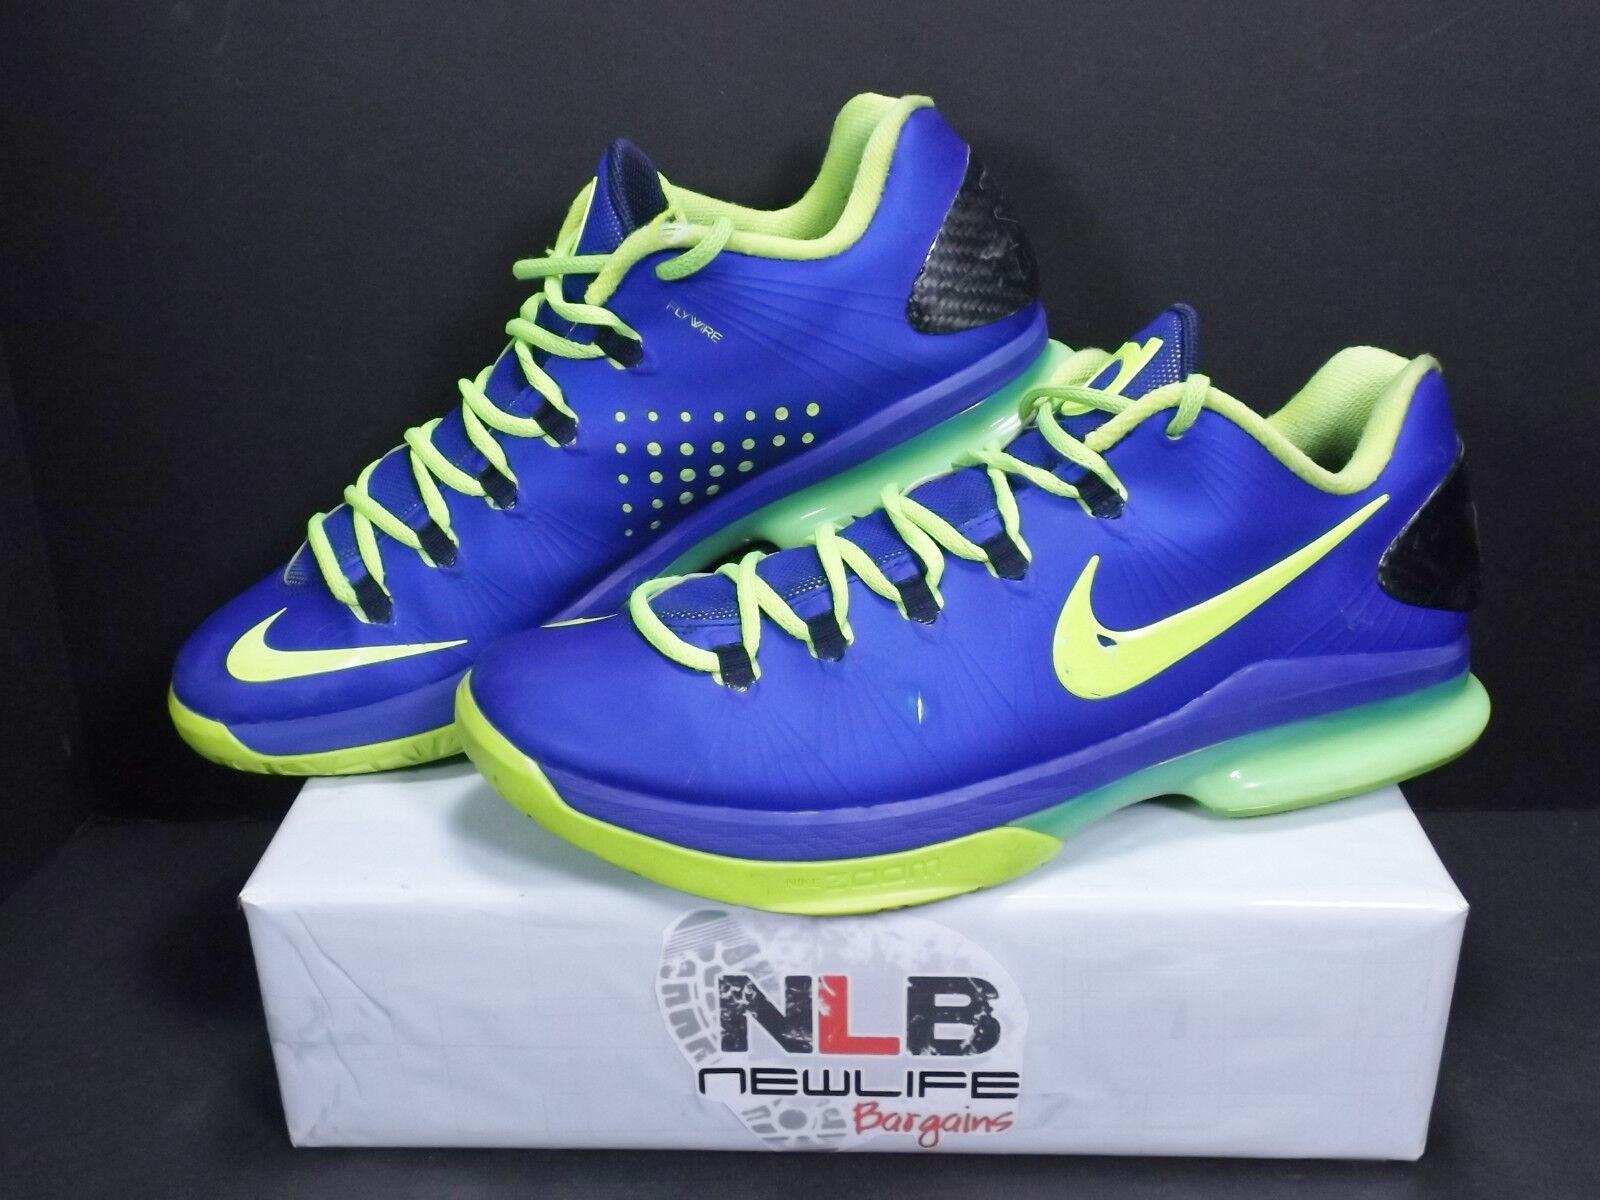 premium selection 1e6a7 efd7d Nike KD V 5 5 5 Elite Basketball 585386-400 Men s Shoes Size 11.5 Blue